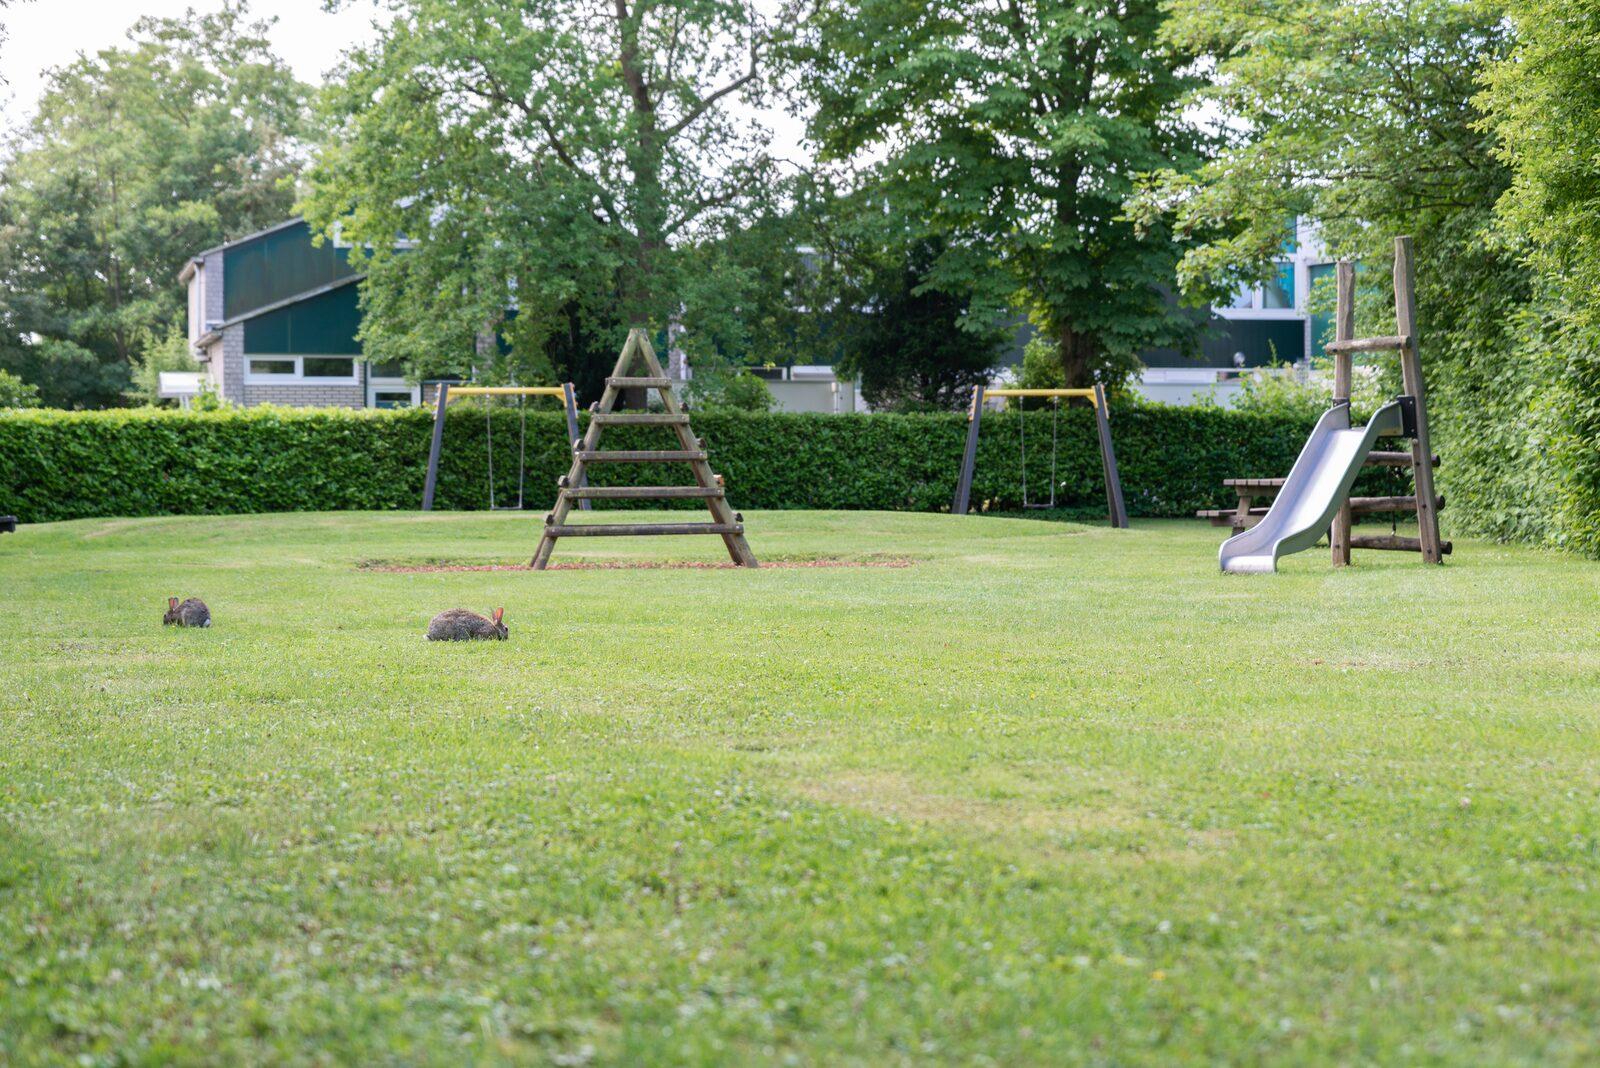 Vakantiewoning - Het smallengange 45 | Kortgene